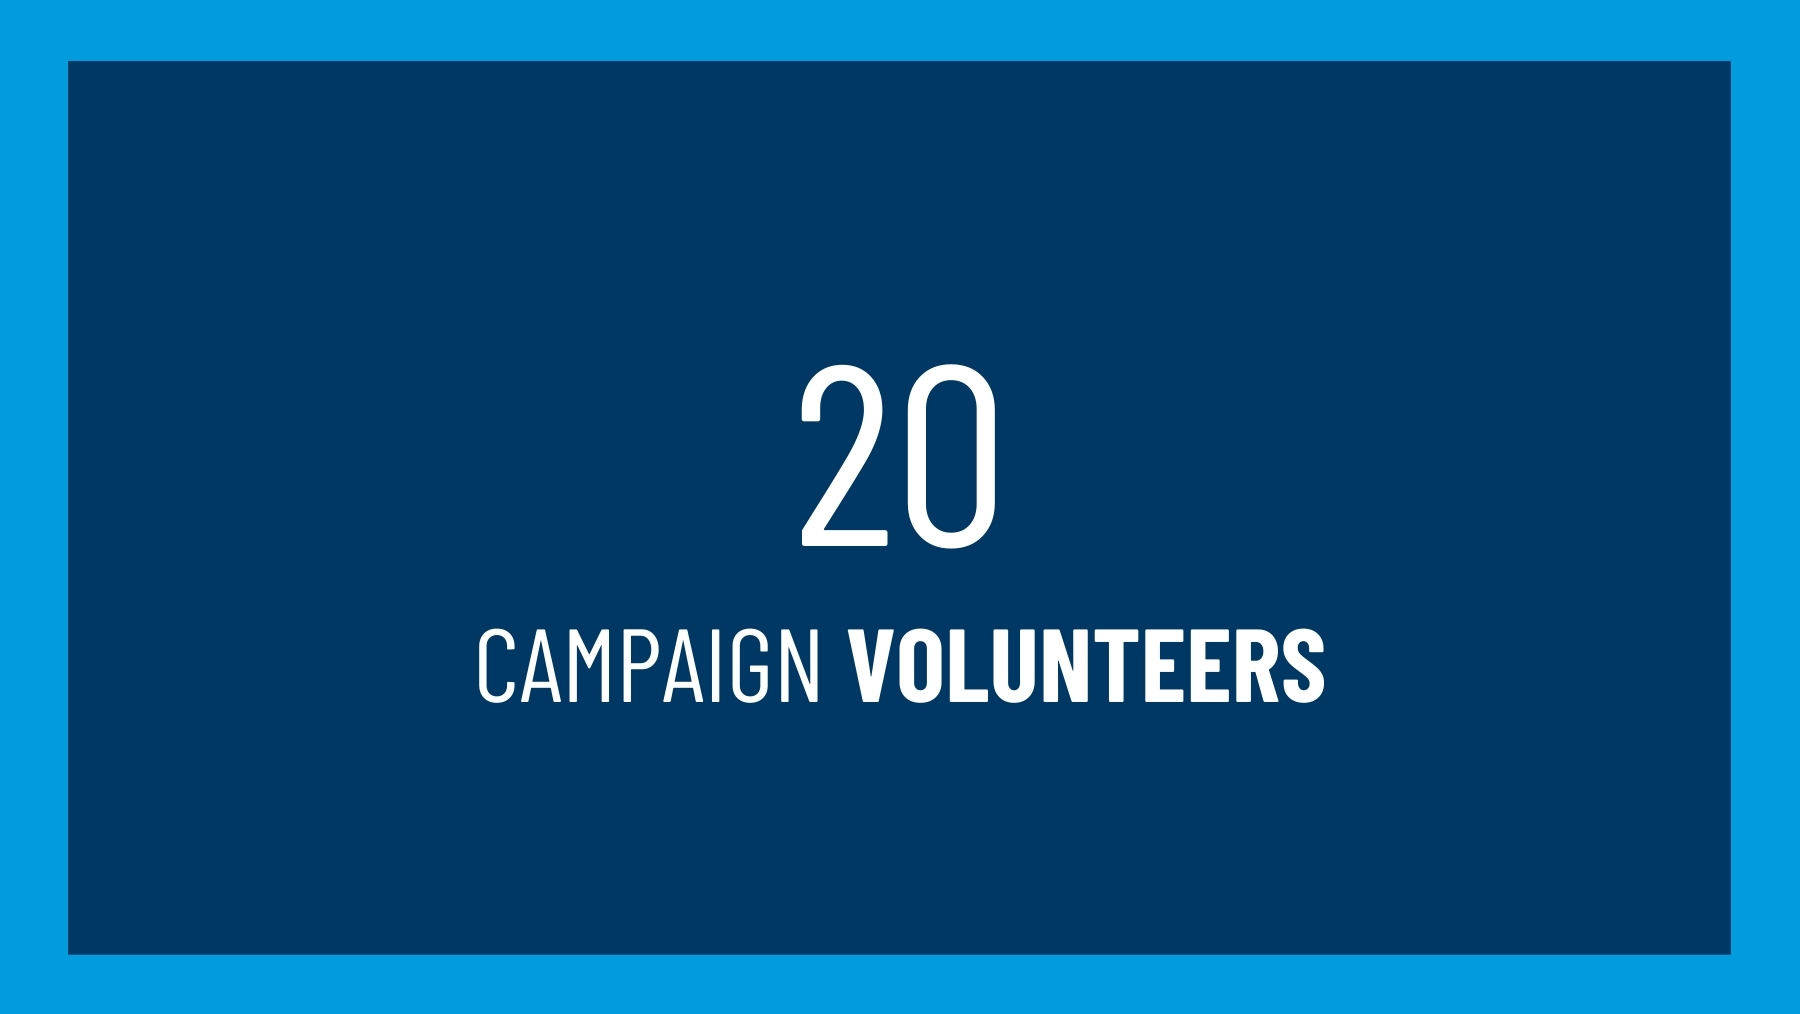 20 campaign volunteers